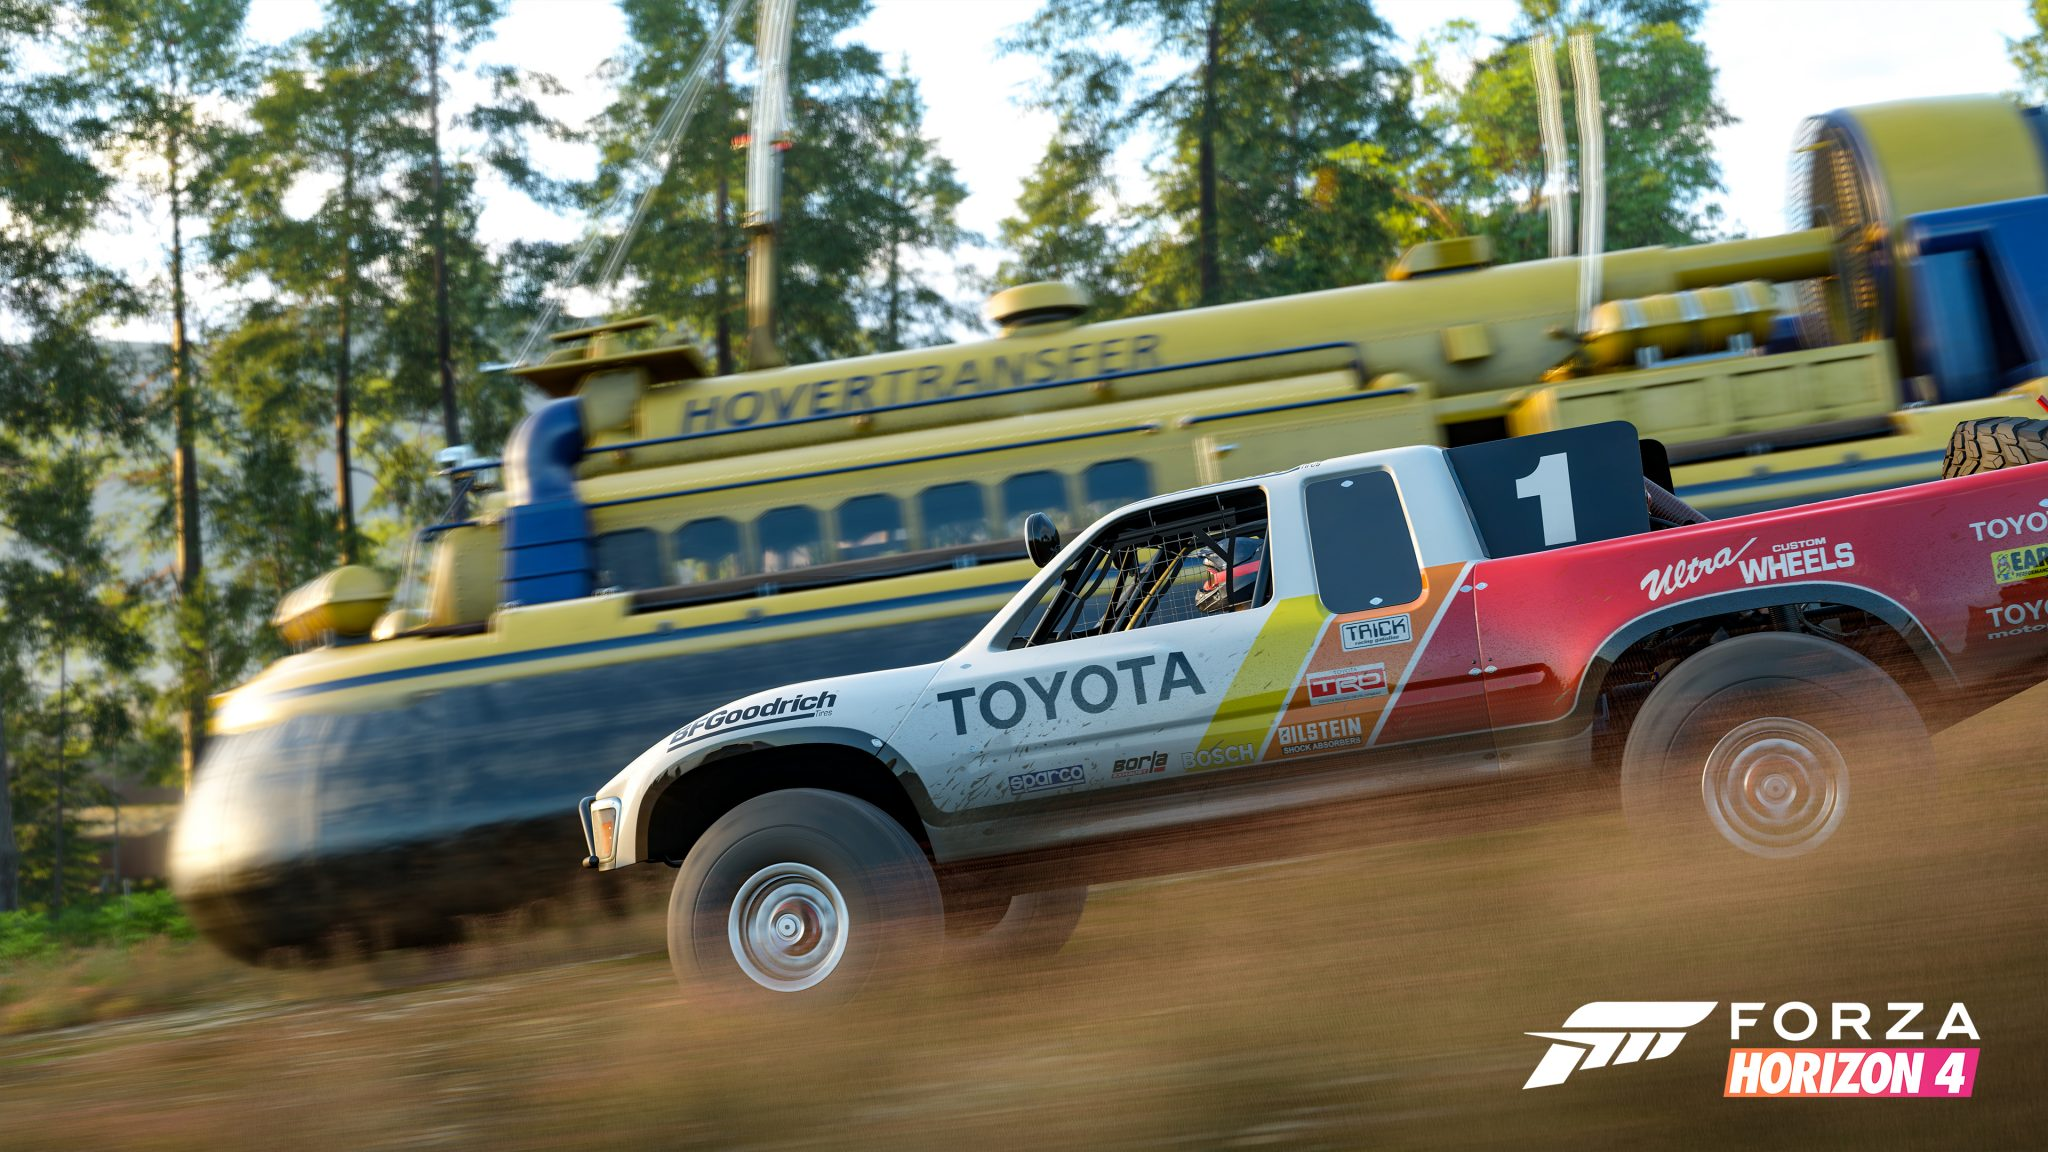 Forza Horizon 4 FH4 Xbox One X PC Ultimate Review Test Kritik Schaurennen